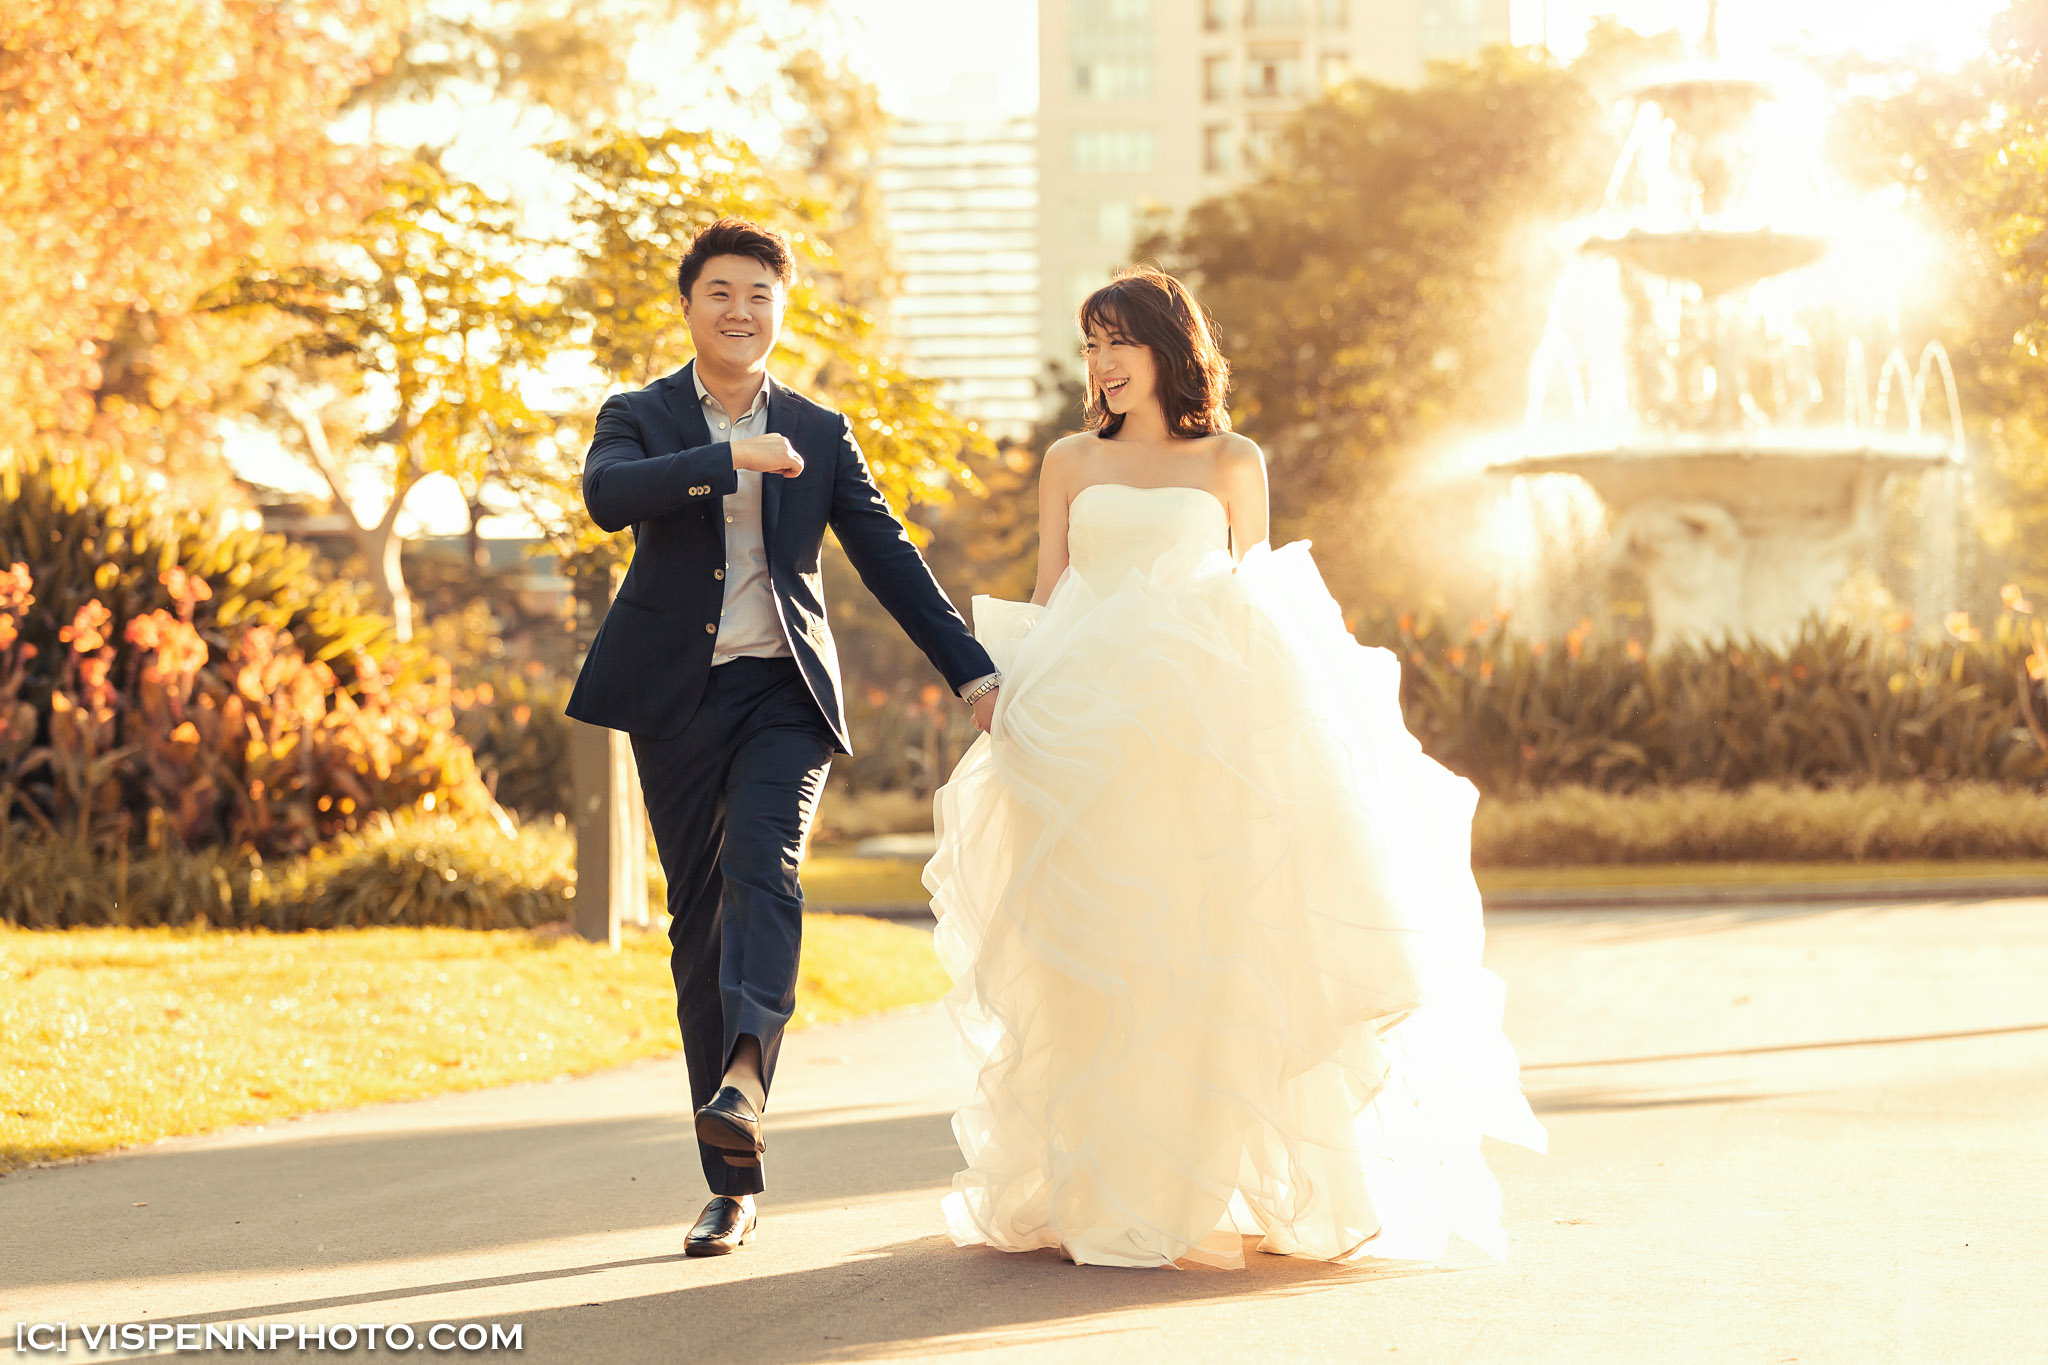 PRE WEDDING Photography Melbourne VISPENN 墨尔本 婚纱照 结婚照 婚纱摄影 5D1 3437